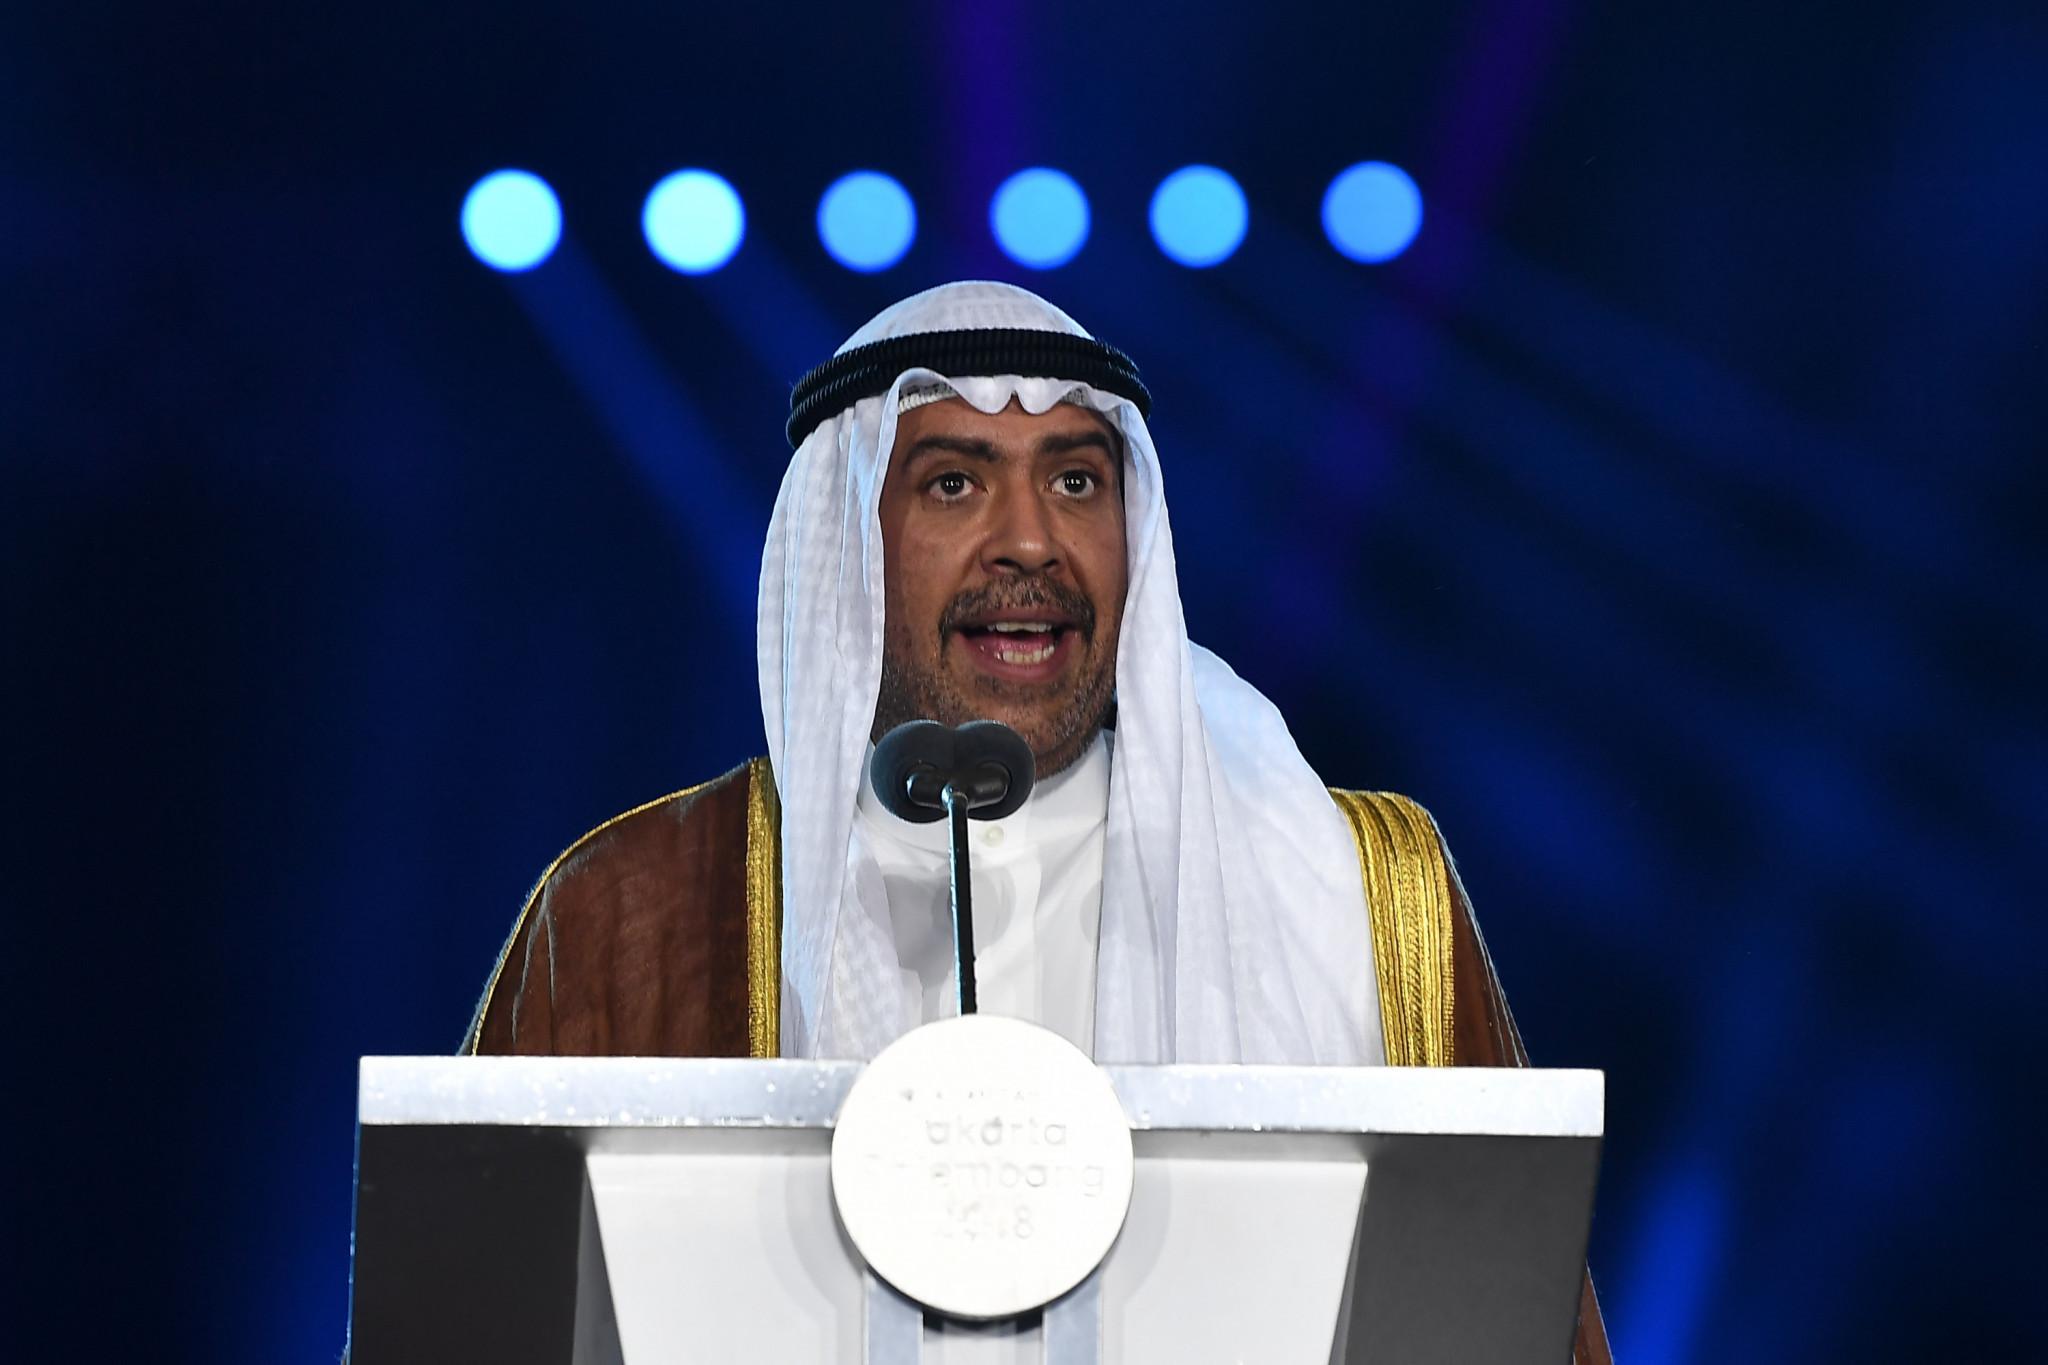 Sheikh Ahmad Al-Fahad Al-Sabah has been President of the OCA since 1991 ©Getty Images